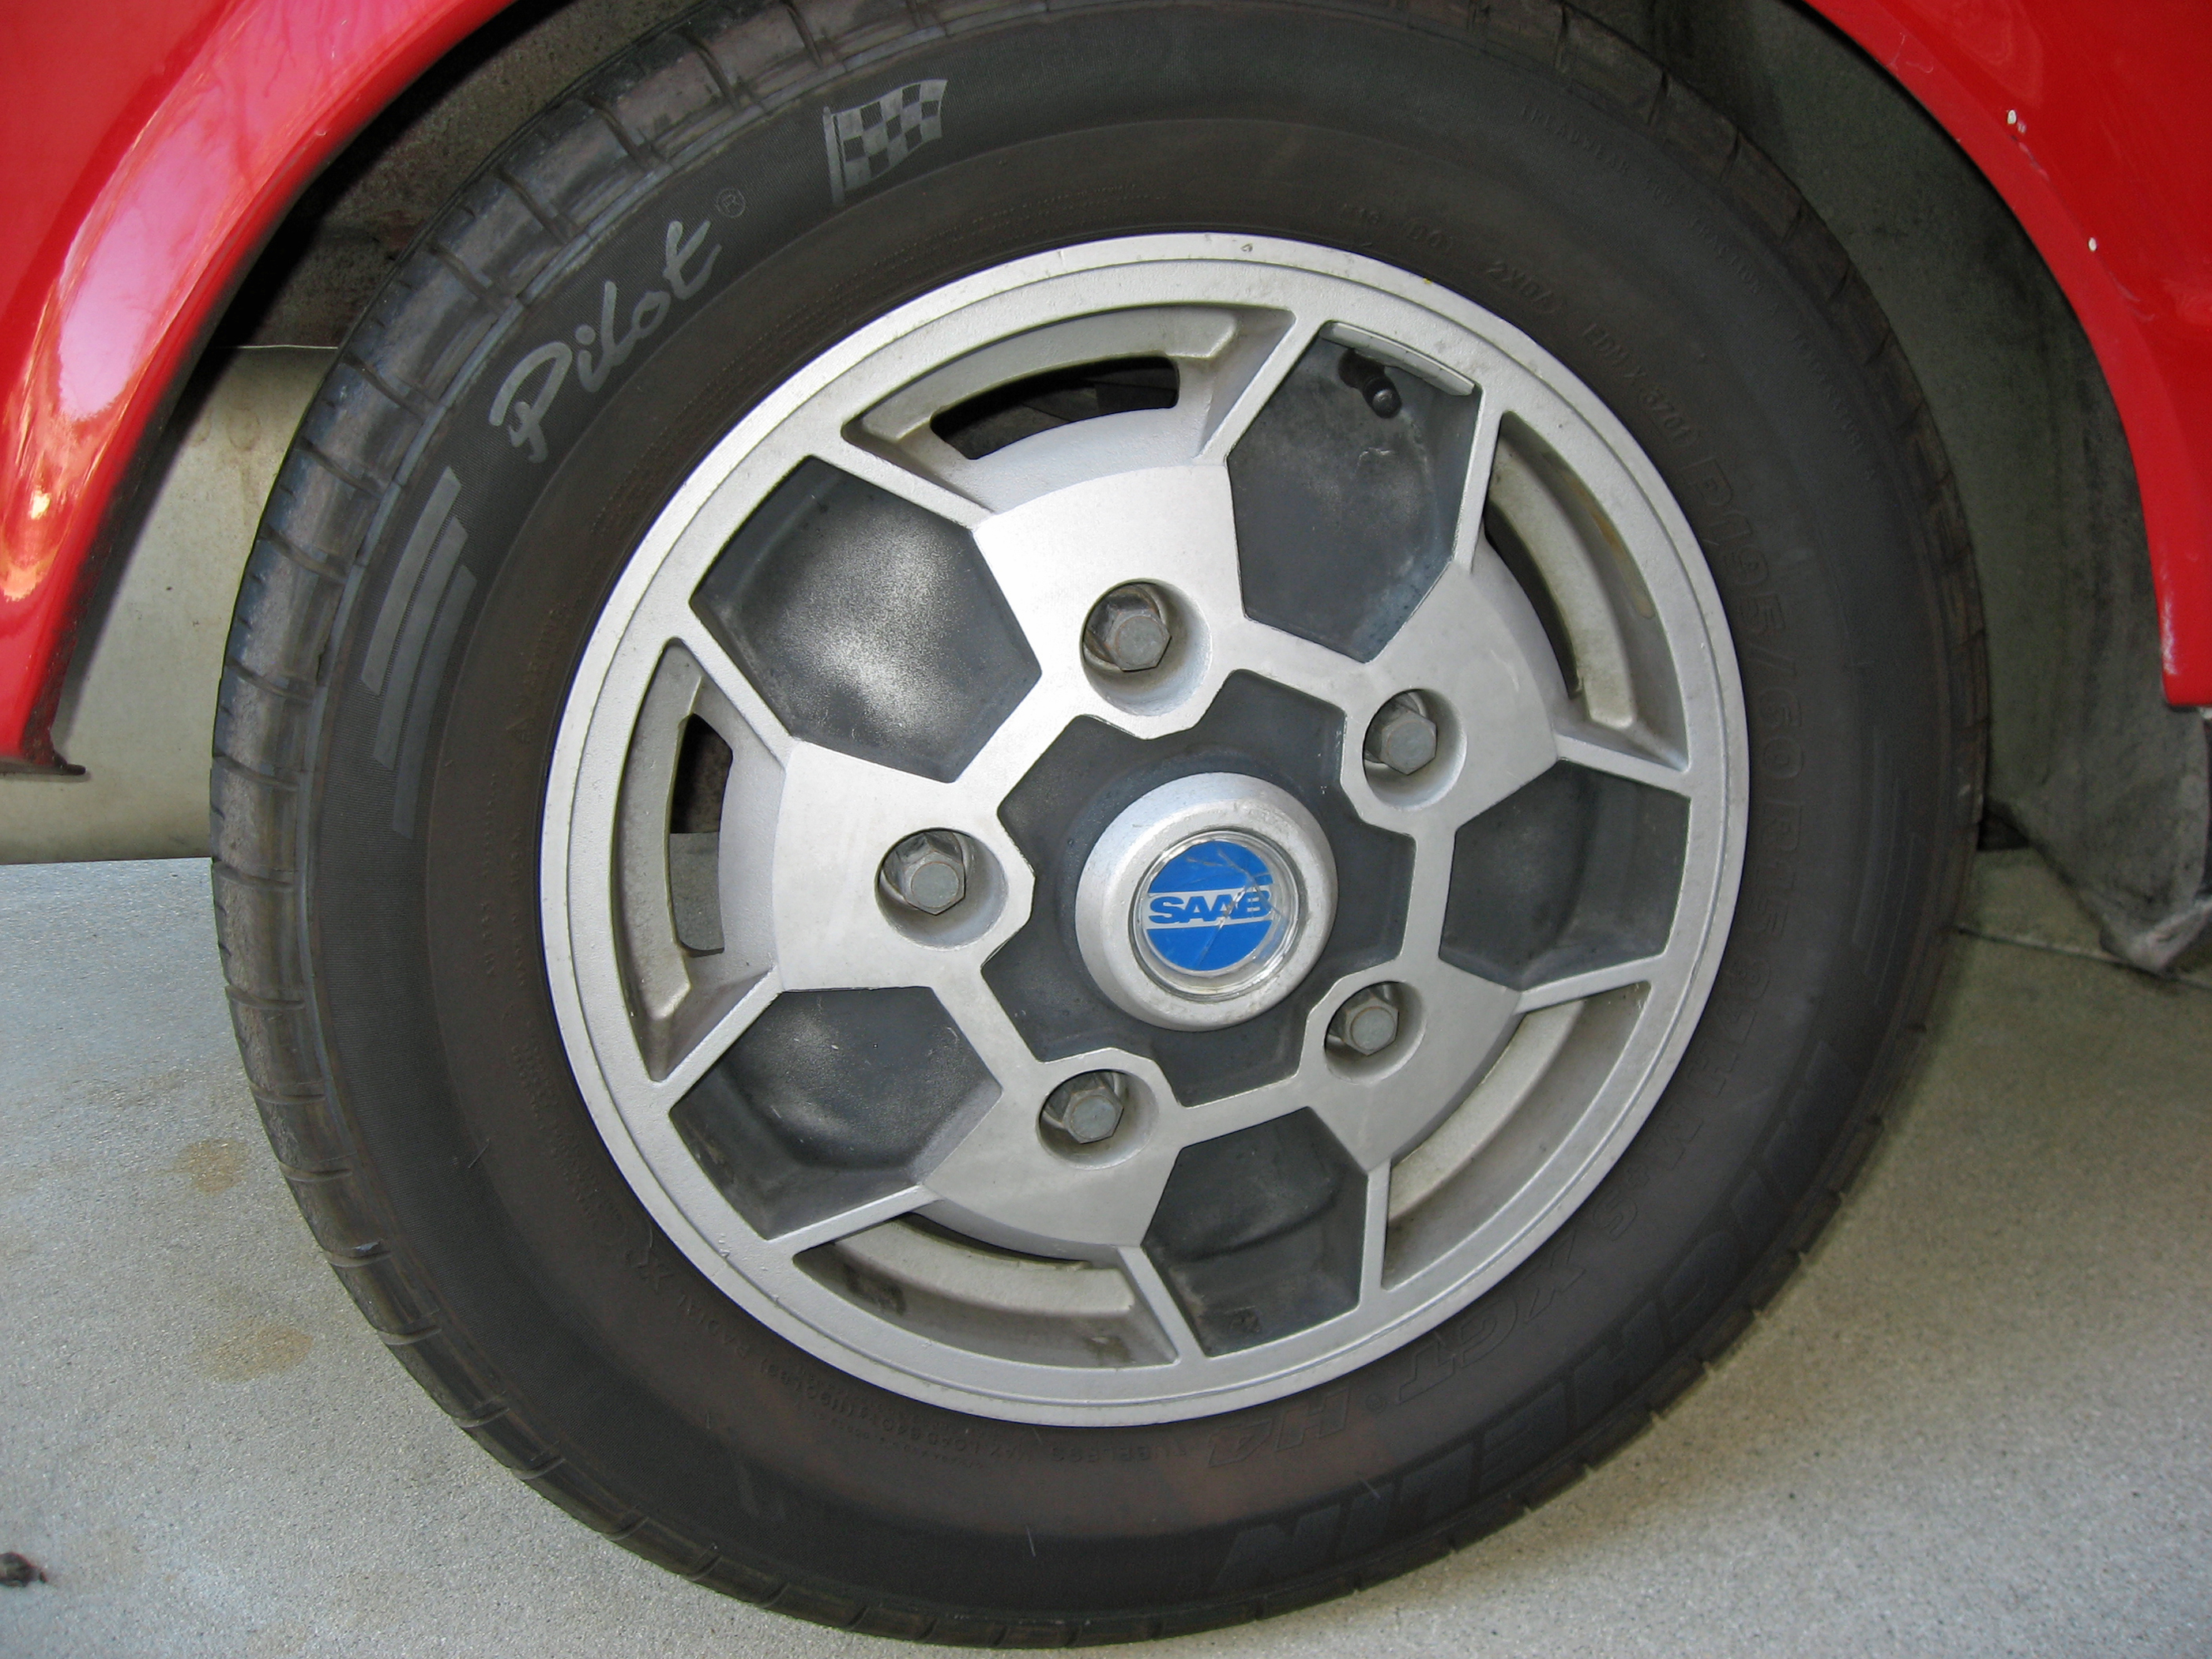 Saab Sonett Wheel